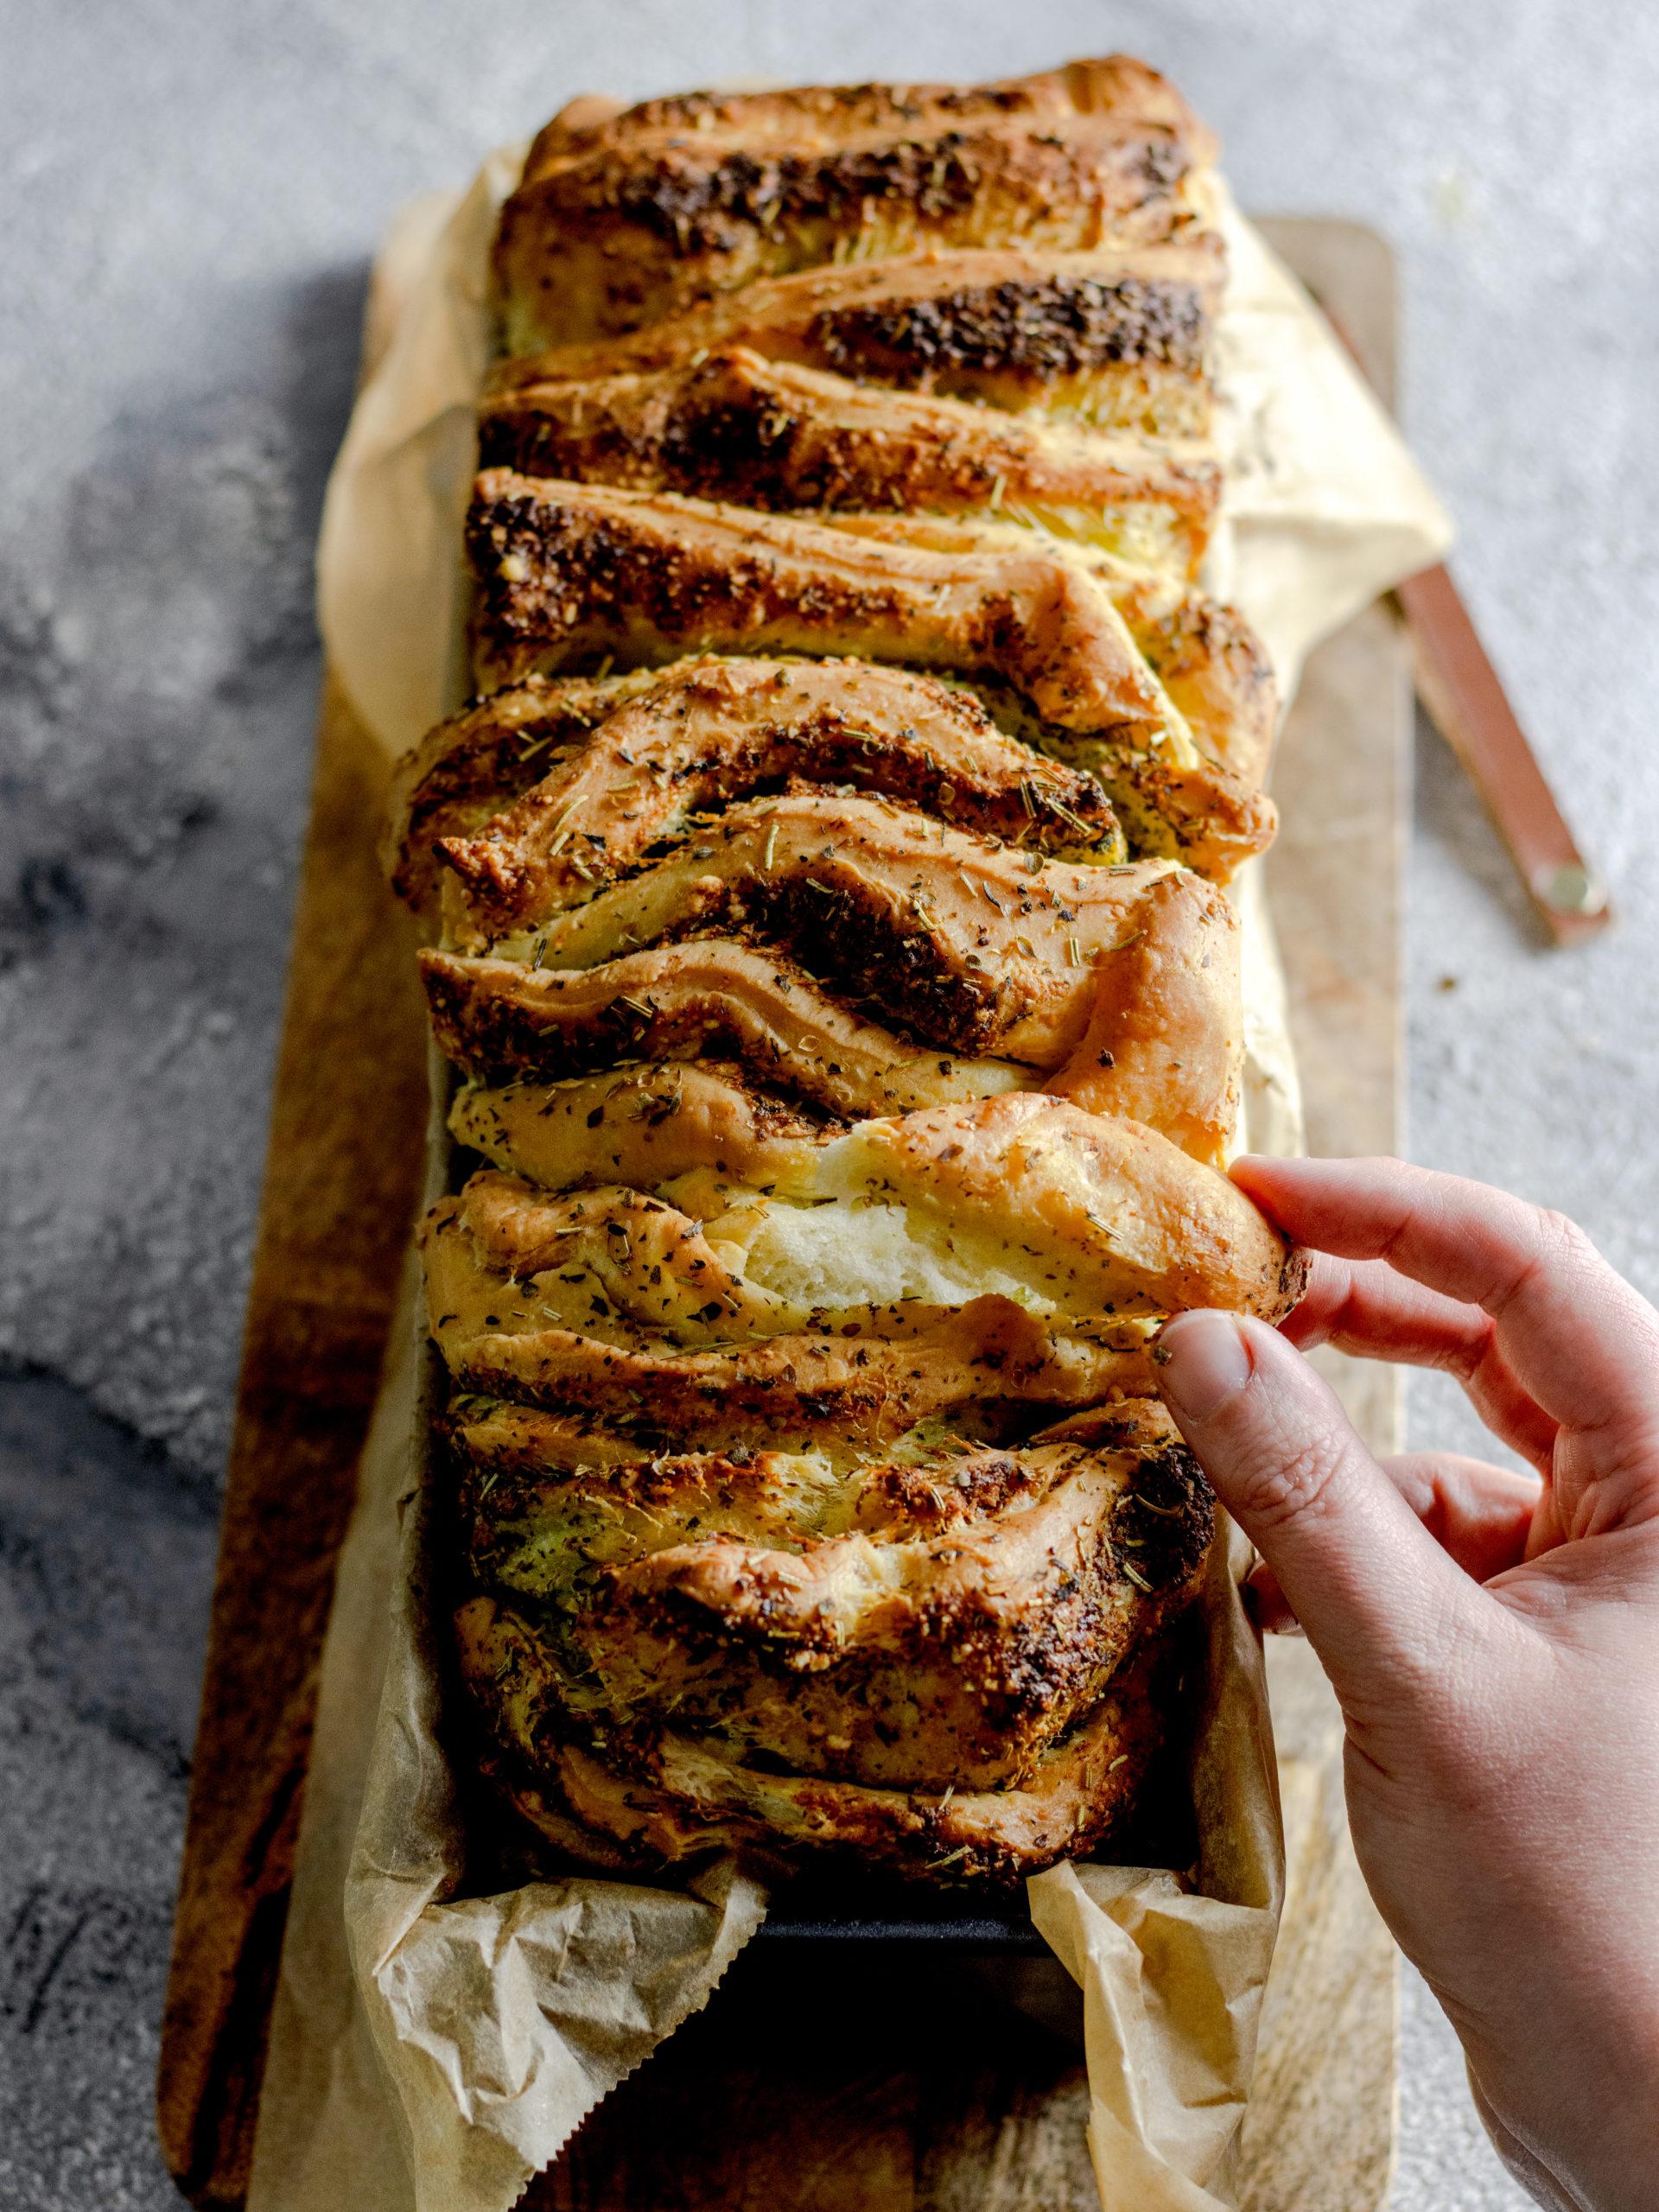 Kräuter-Knoblauch-Zupfbrot mit Parmesan